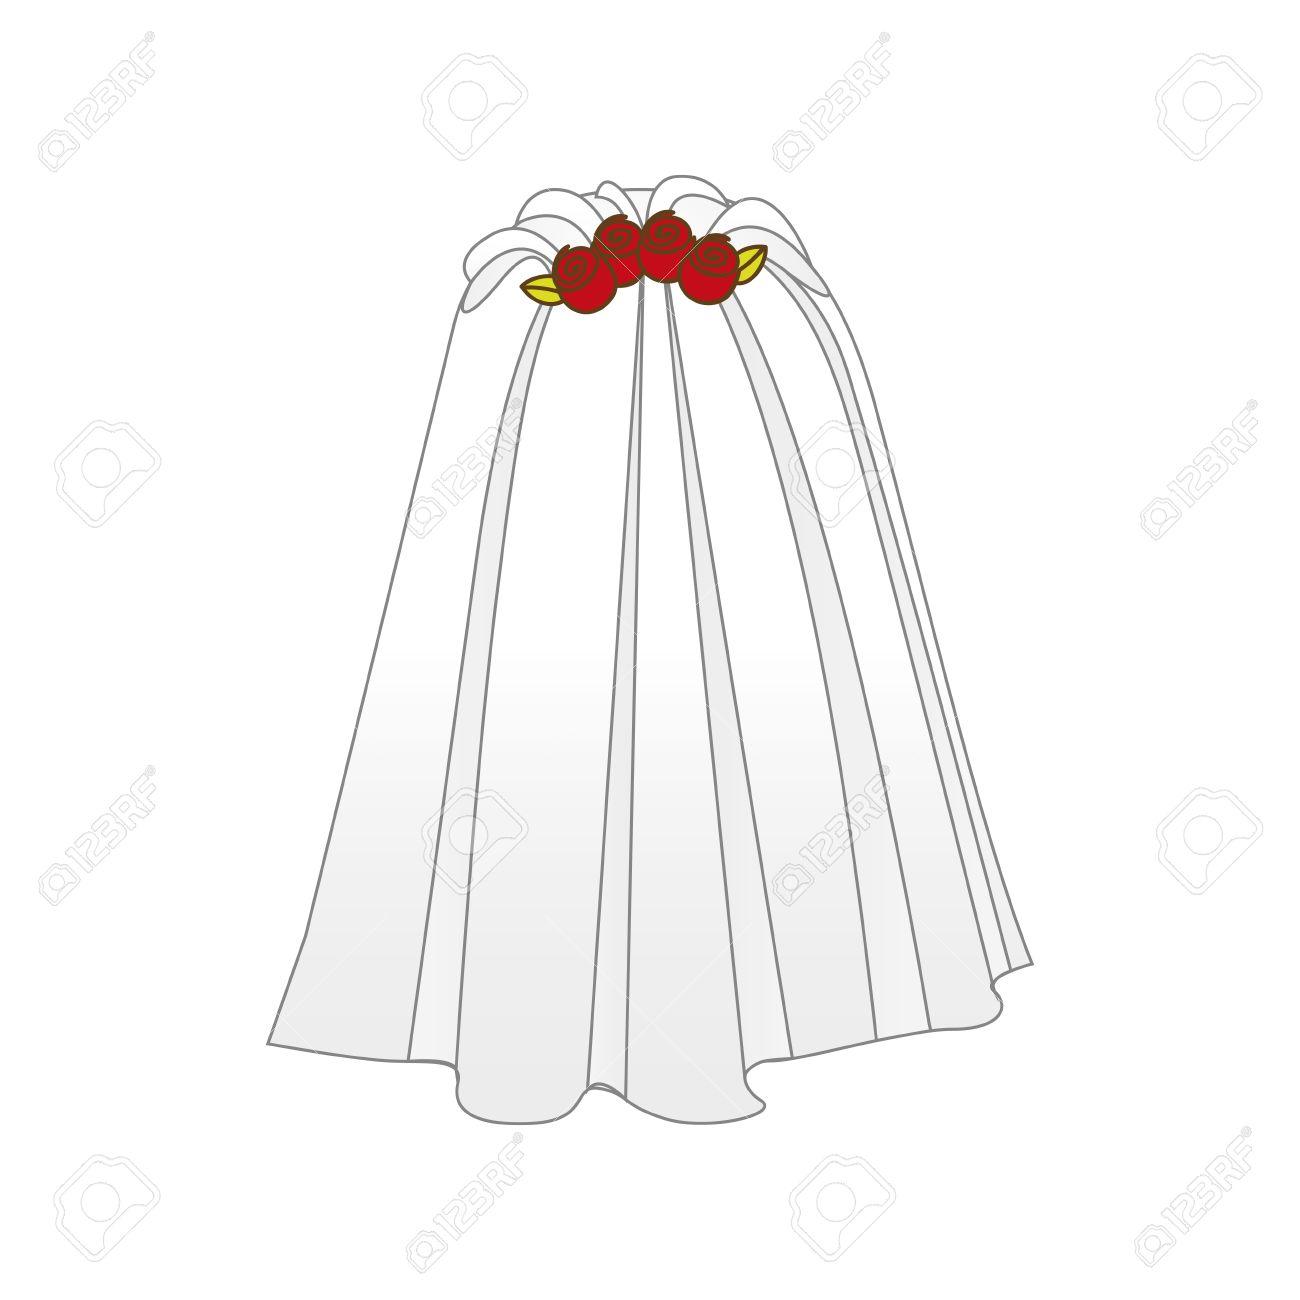 bride veil icon image vector illustration design - 66474096